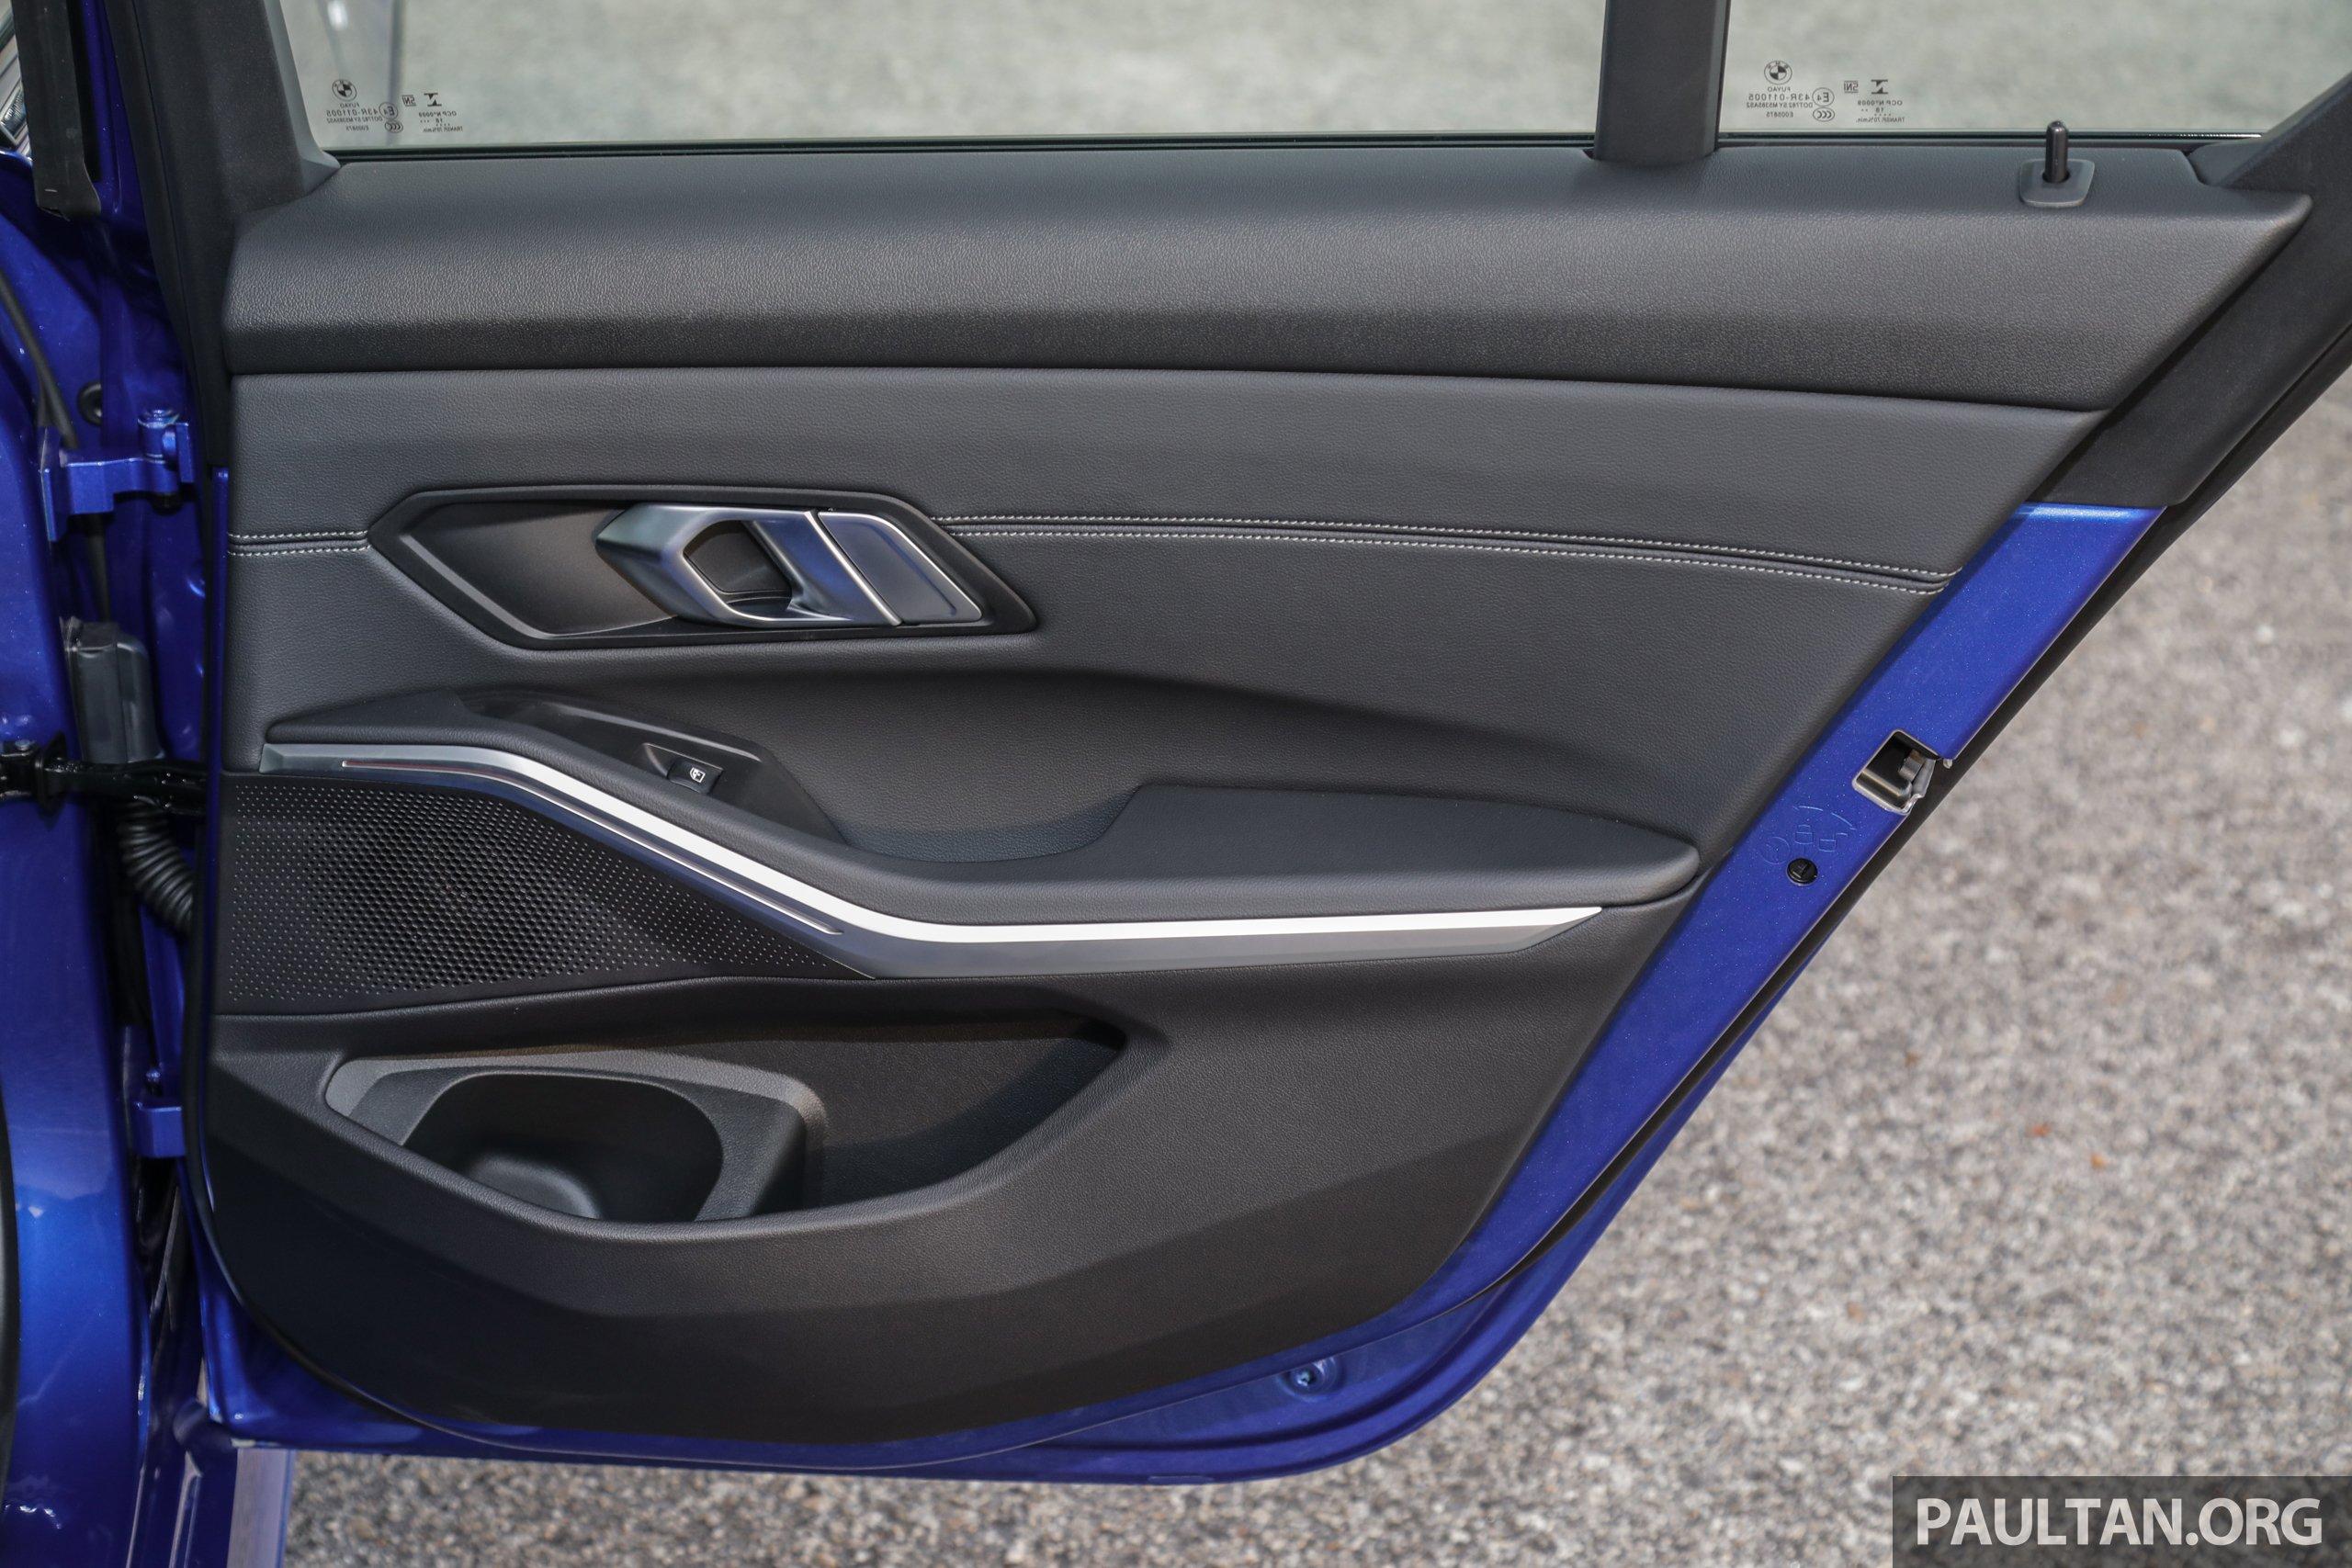 BMW 3 Series G20 CKD Diperkenalkan Di Pasaran Malaysia